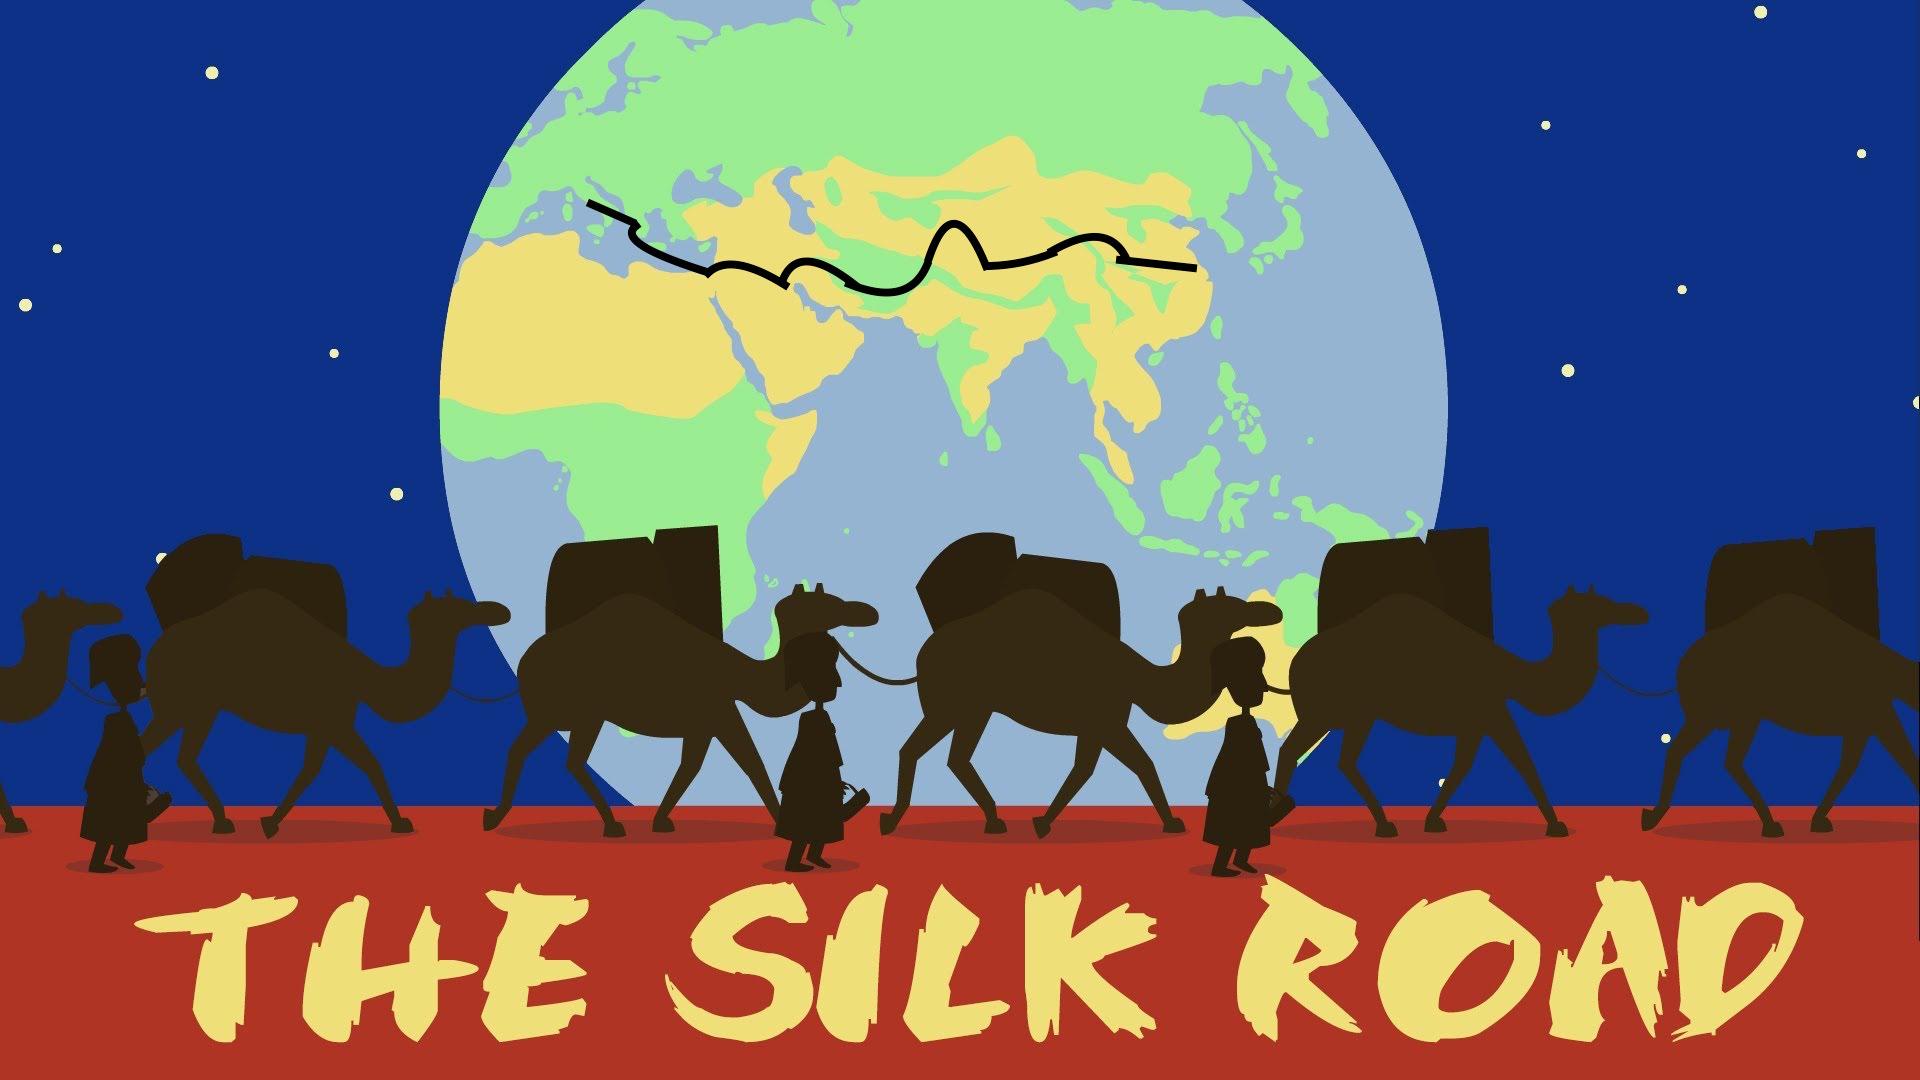 The Silk Road.